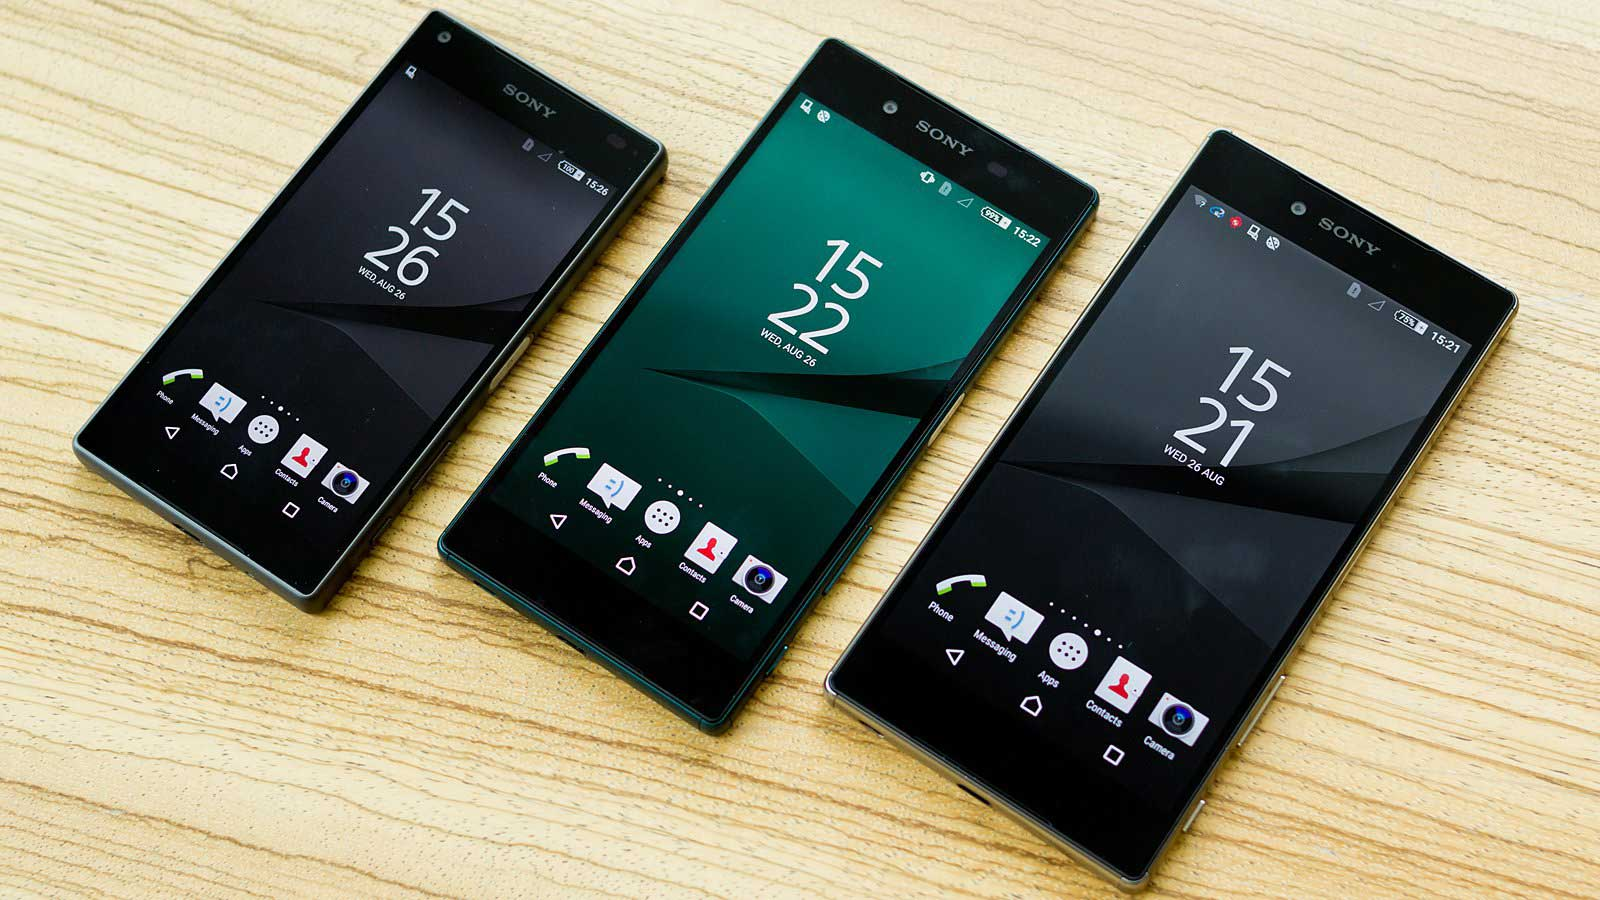 Telefon sesi attırma Telefonlarda Ses Geliştirme Sony Akıllı Telefonlarda Ses Geliştirme telefon sesi arttirma